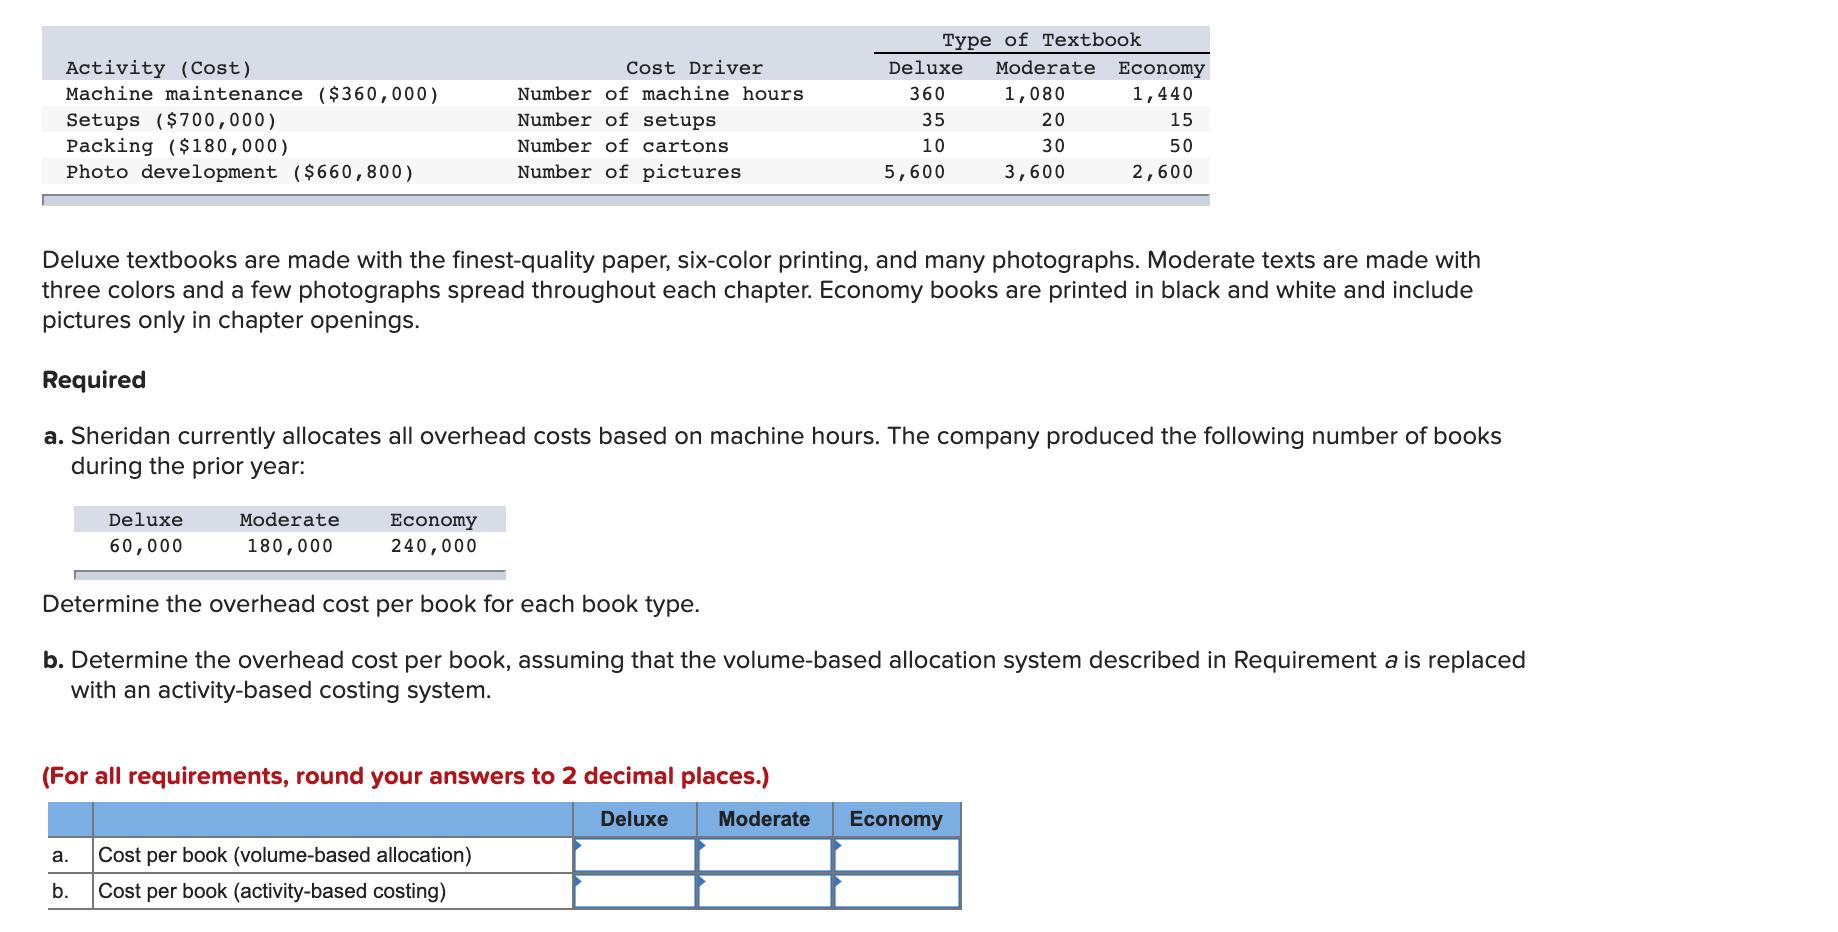 Activity (Cost) Machine maintenance ($360,000) Setups ($700,000) Packing ($180,000) Photo development ($660,800) Cost Driver